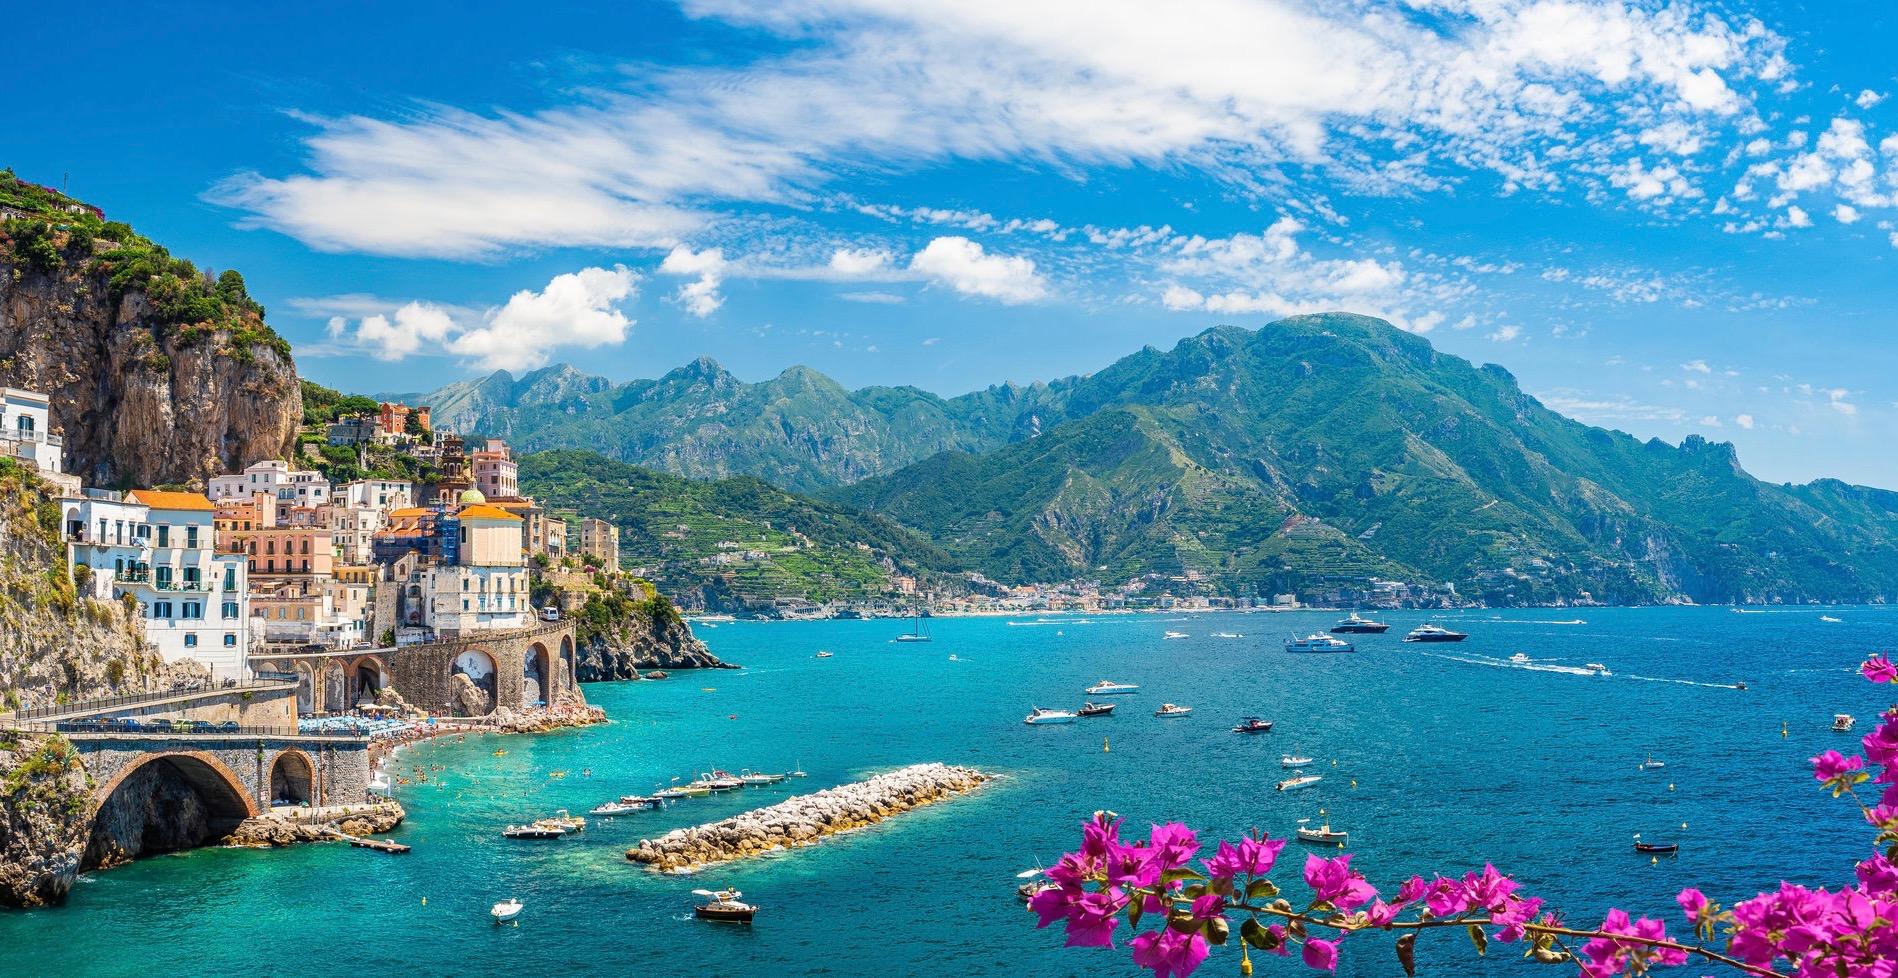 Three Italian road trips every food lover needs to take